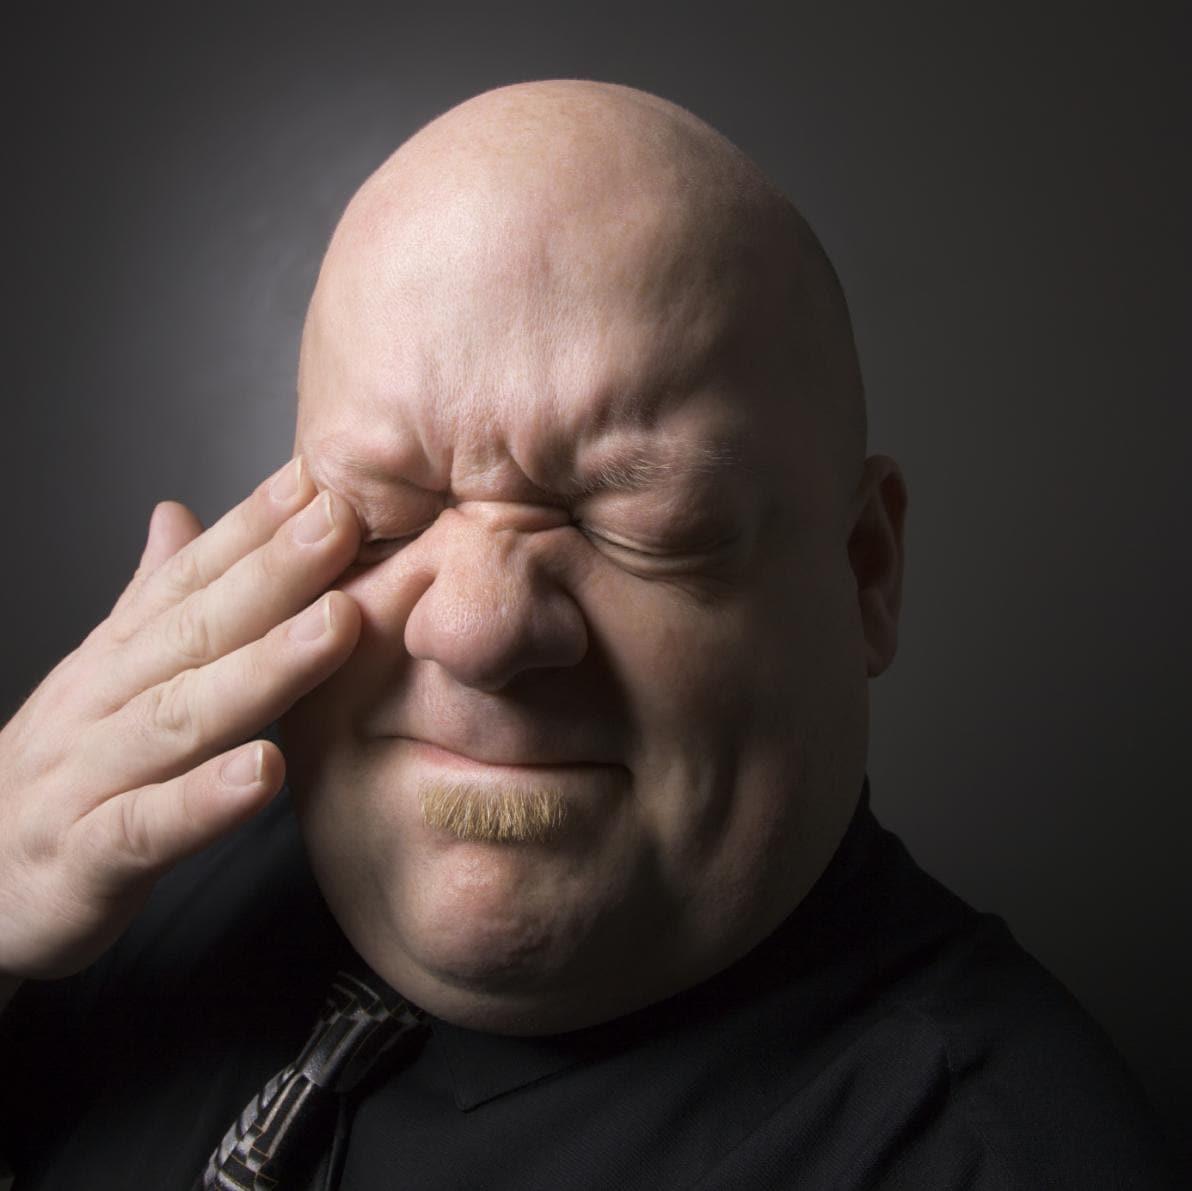 Sintomi del glaucoma